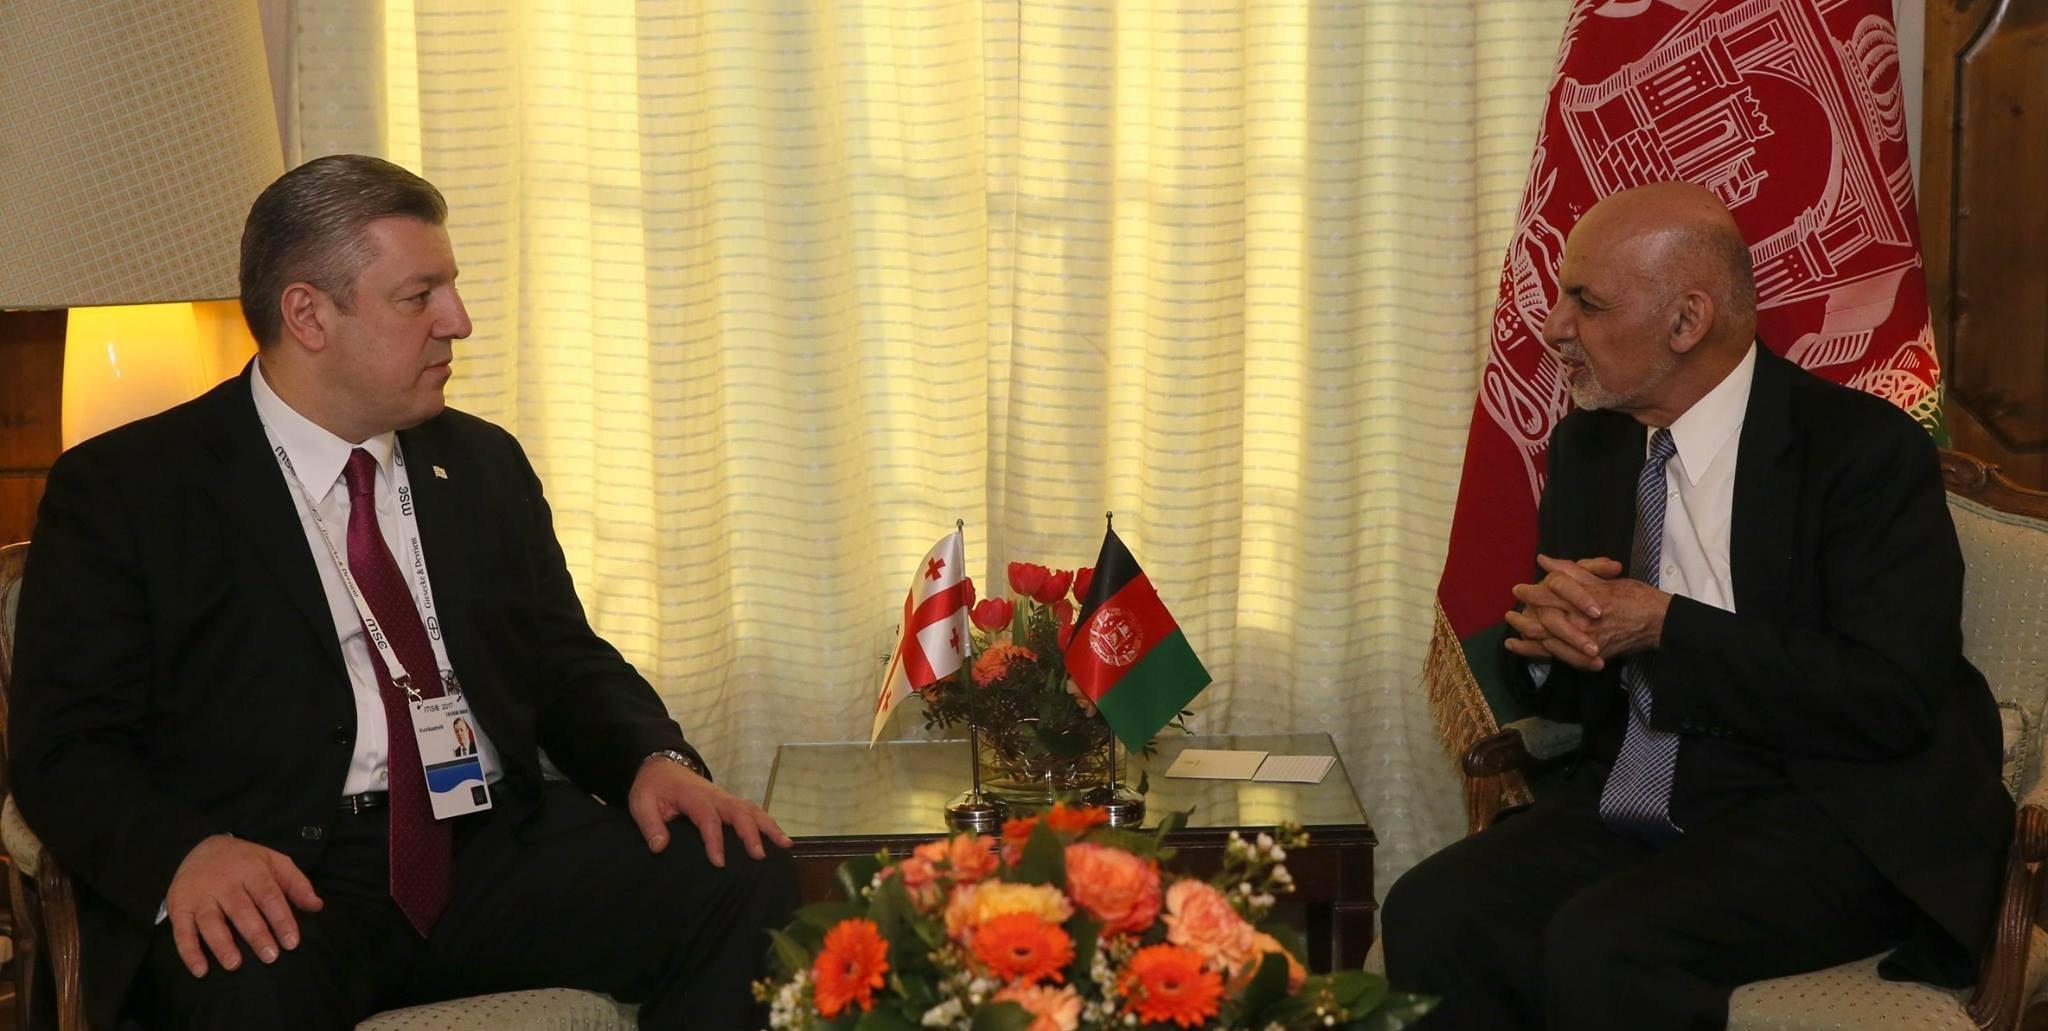 Премьер Грузии Георгий Квирикашвили и президент Афганистана Мохамед Ашраф Гани